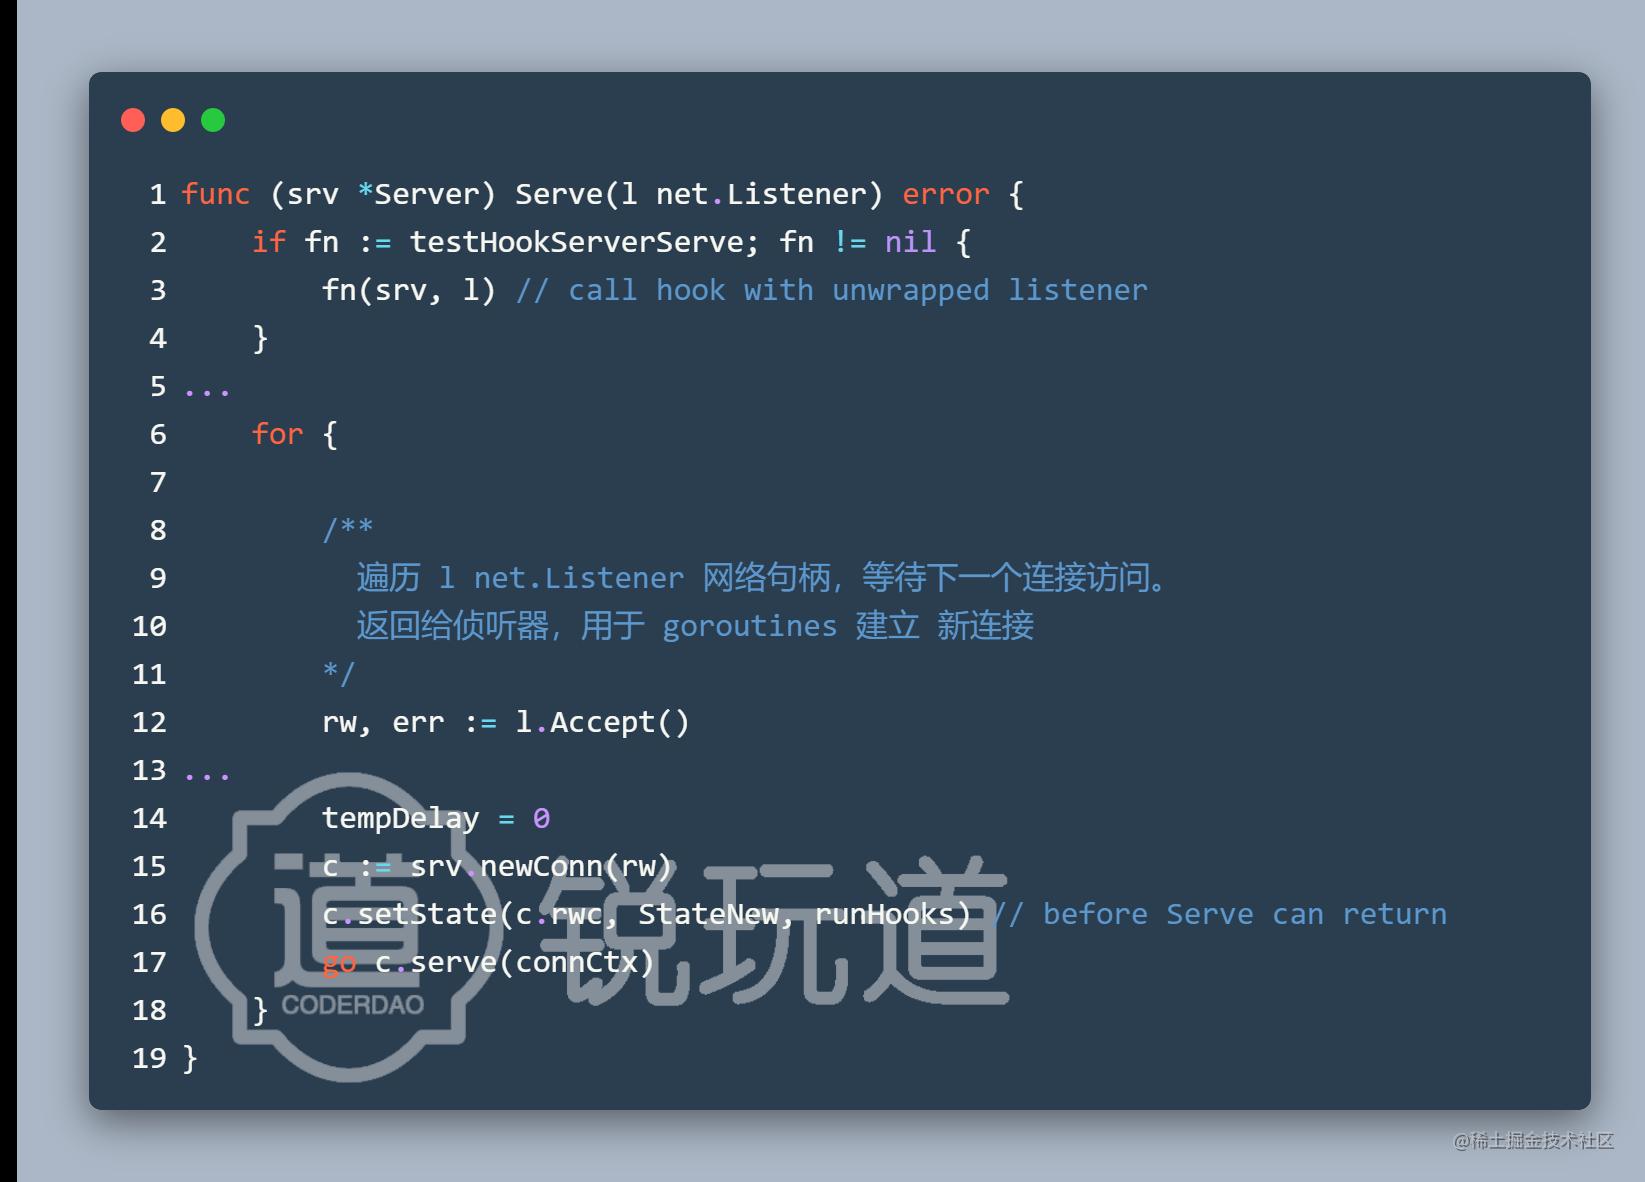 code-snapshot (2).png